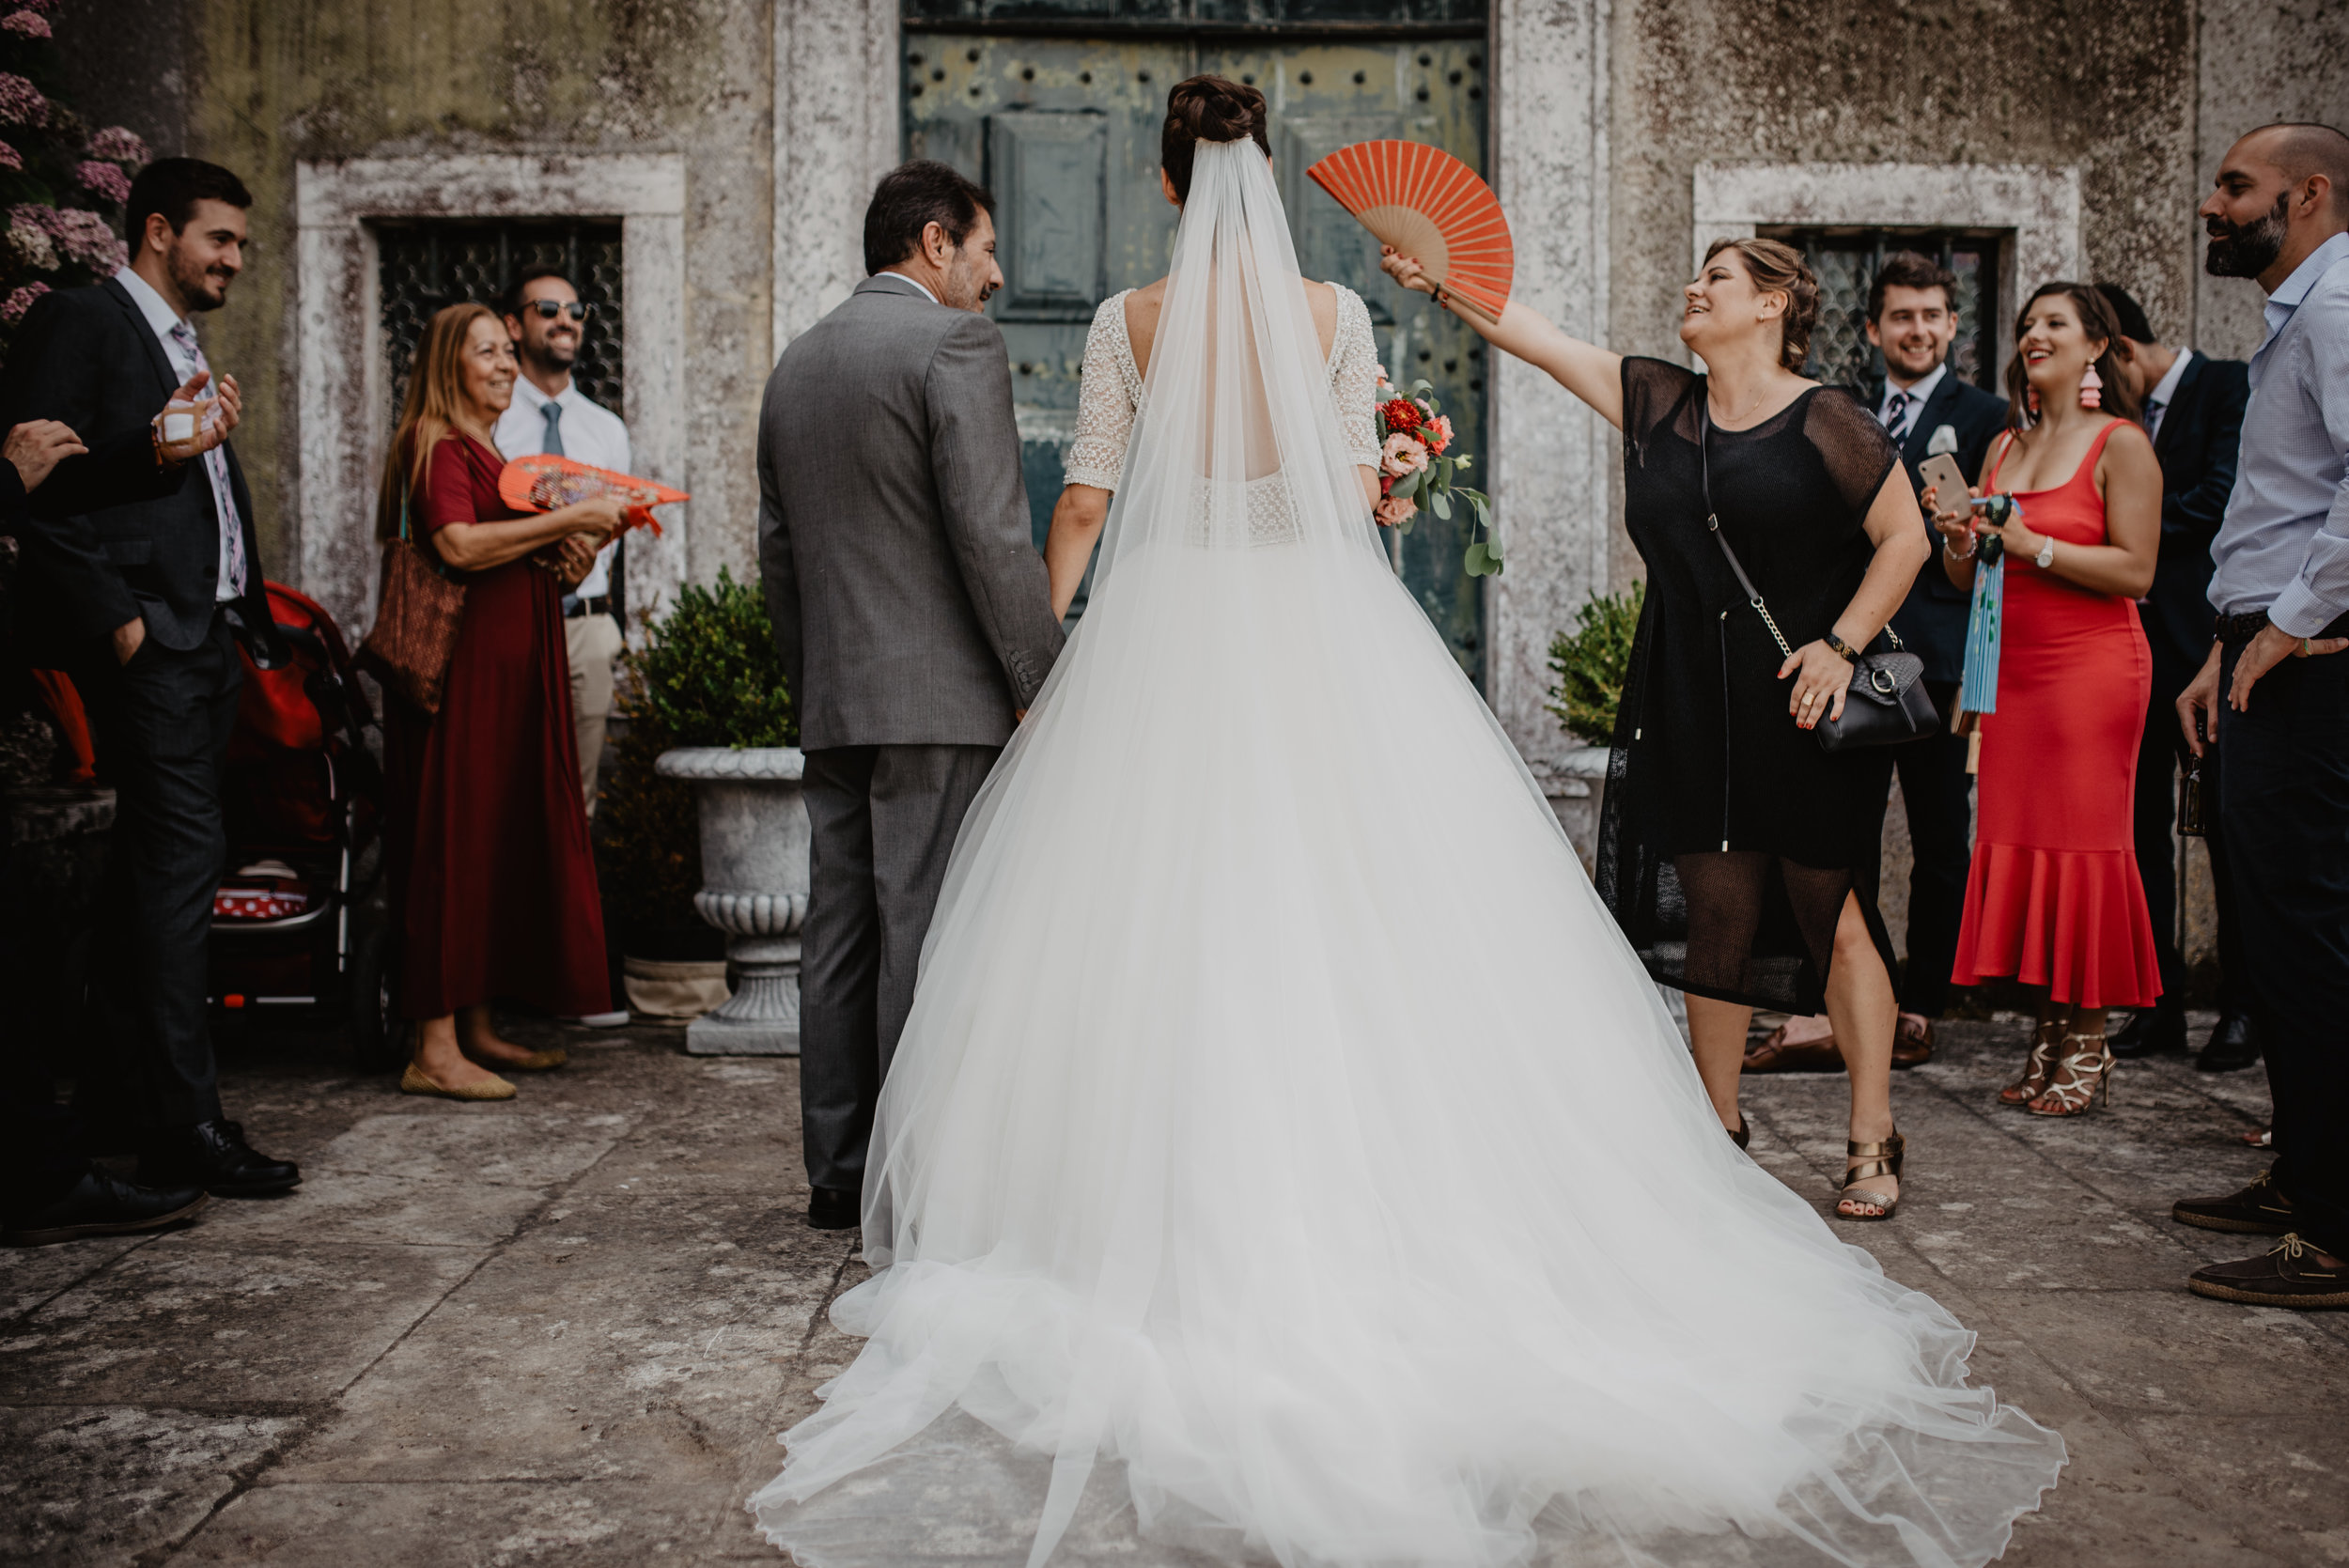 Lapela-photography-wedding-sintra-portugal-53.jpg